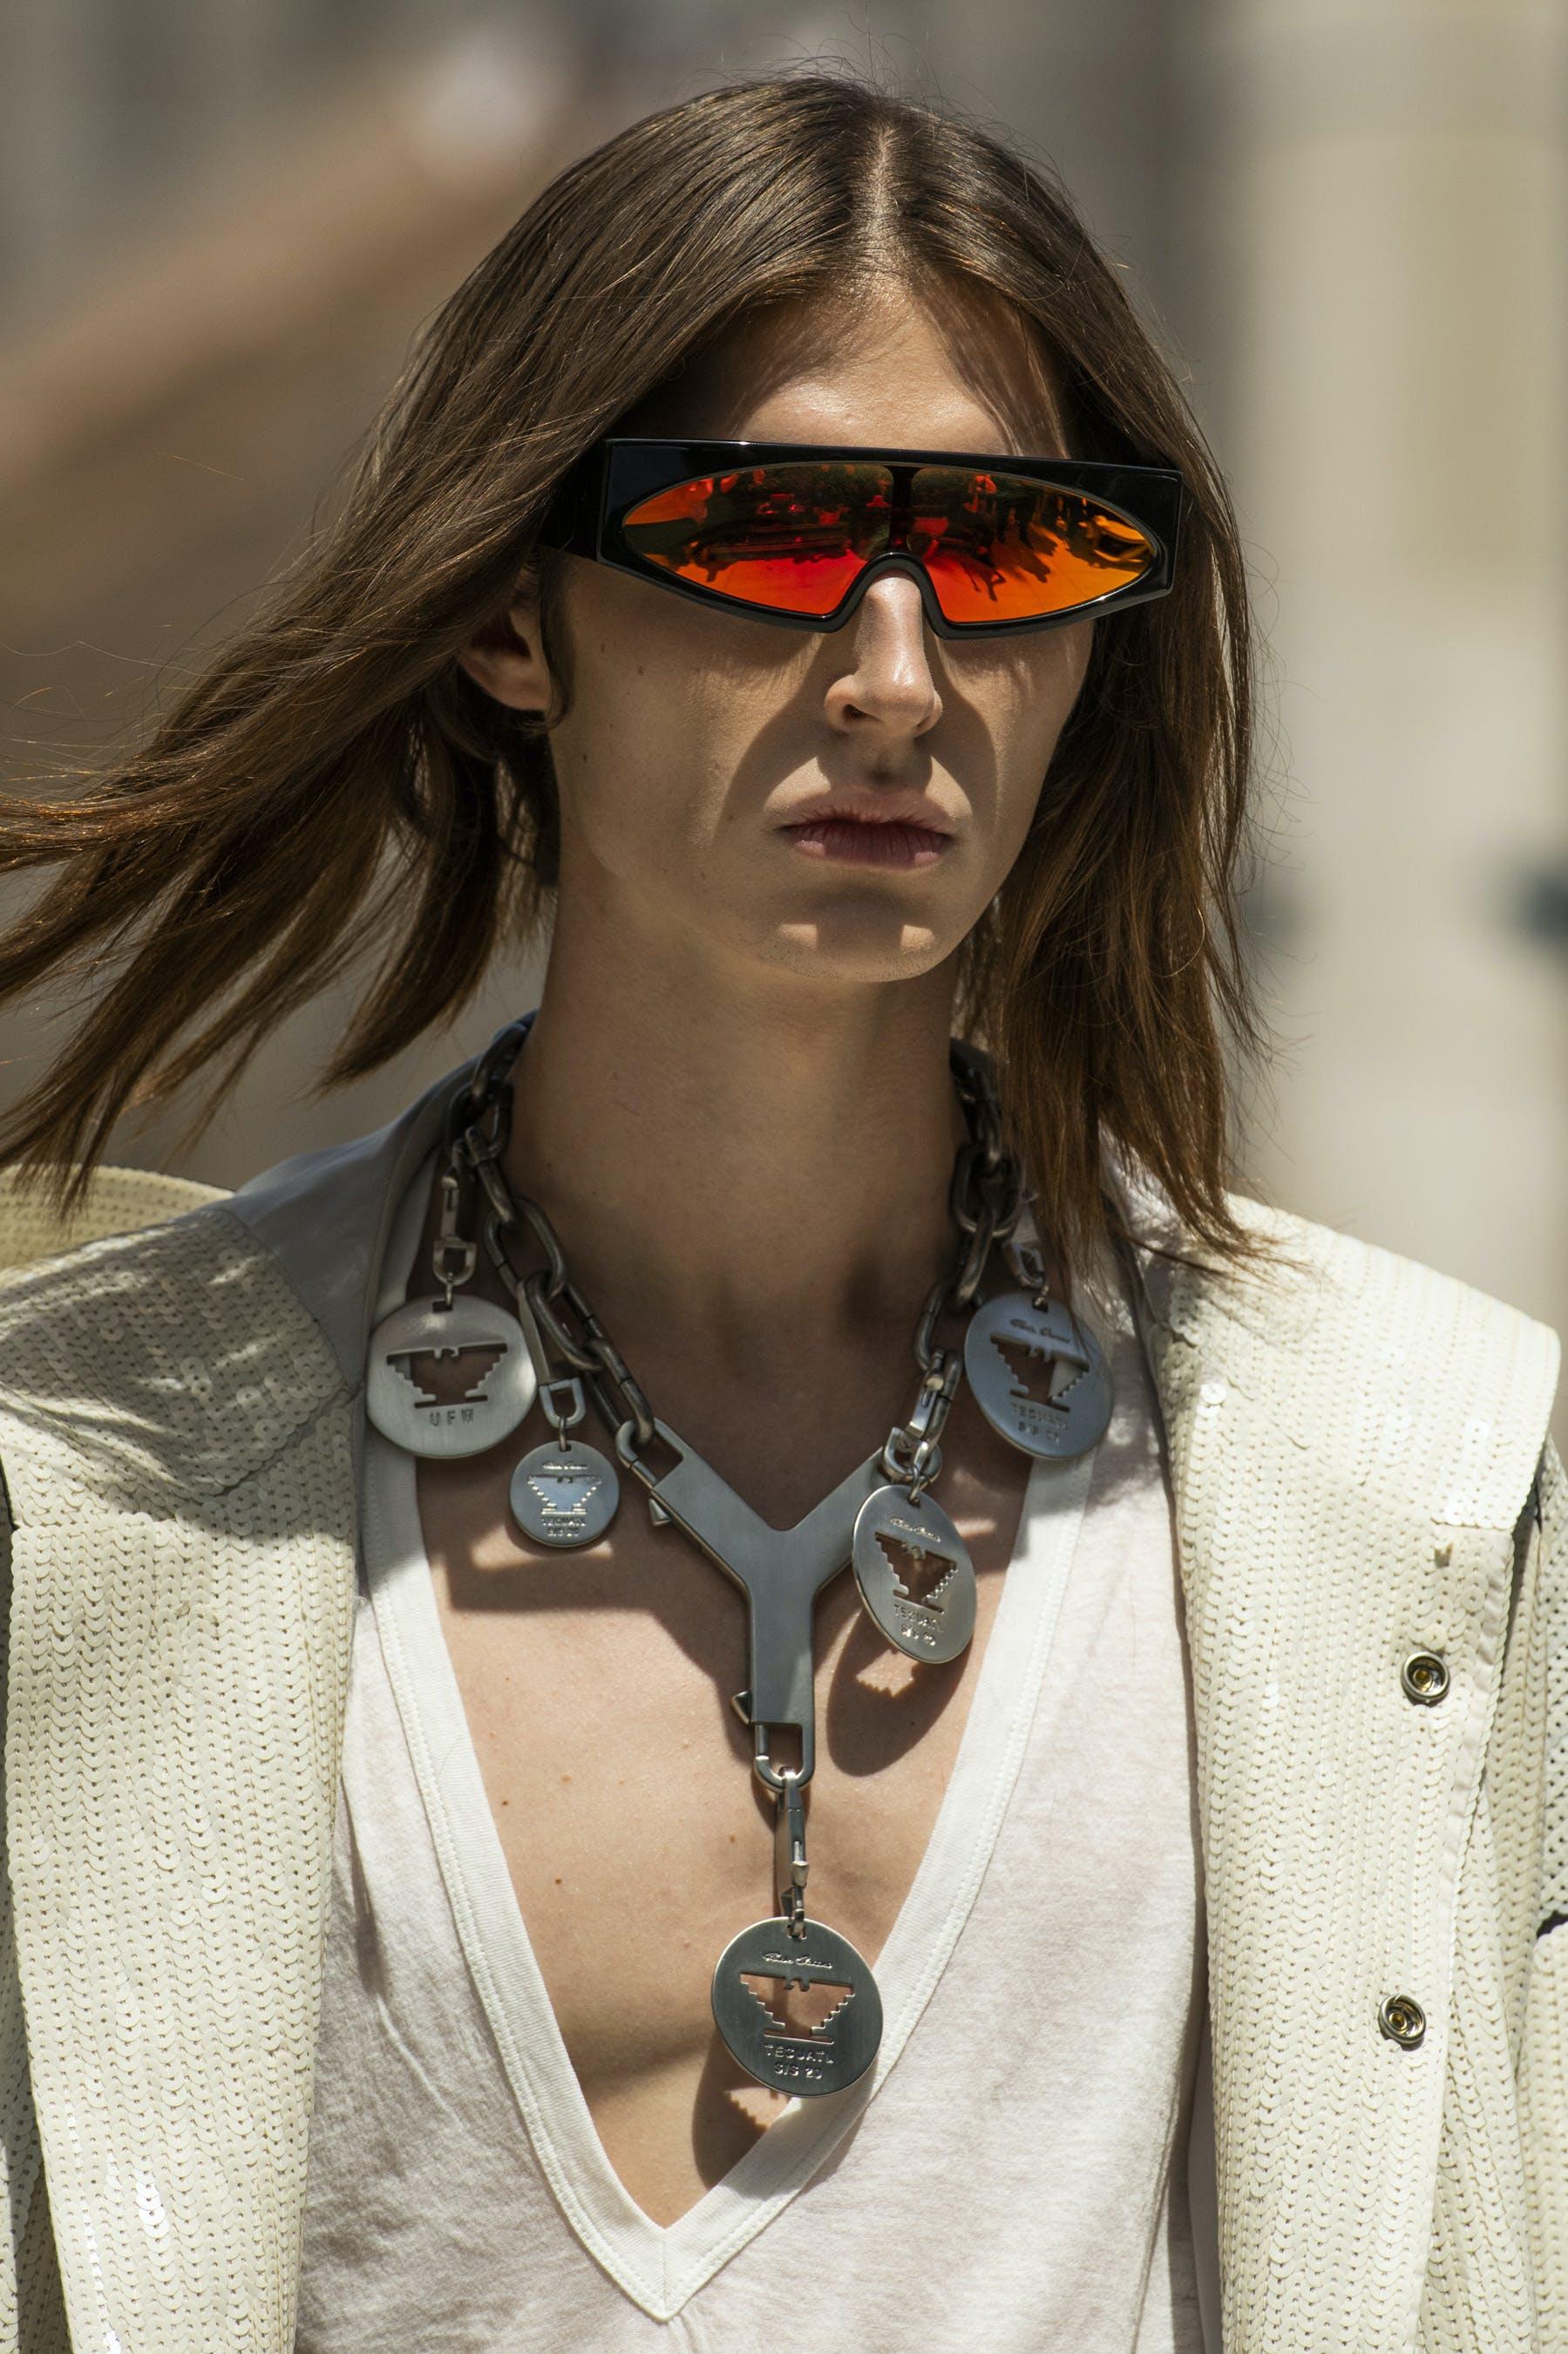 Rick Owens Runway Details Retro Futuristic Black Rectangular Framed Sunglasses Red Reflective Lenses Chain Necklace Cerberus Key Chain UFW Aztec Eagle Logo Pendants Mens SS20 Tecautl